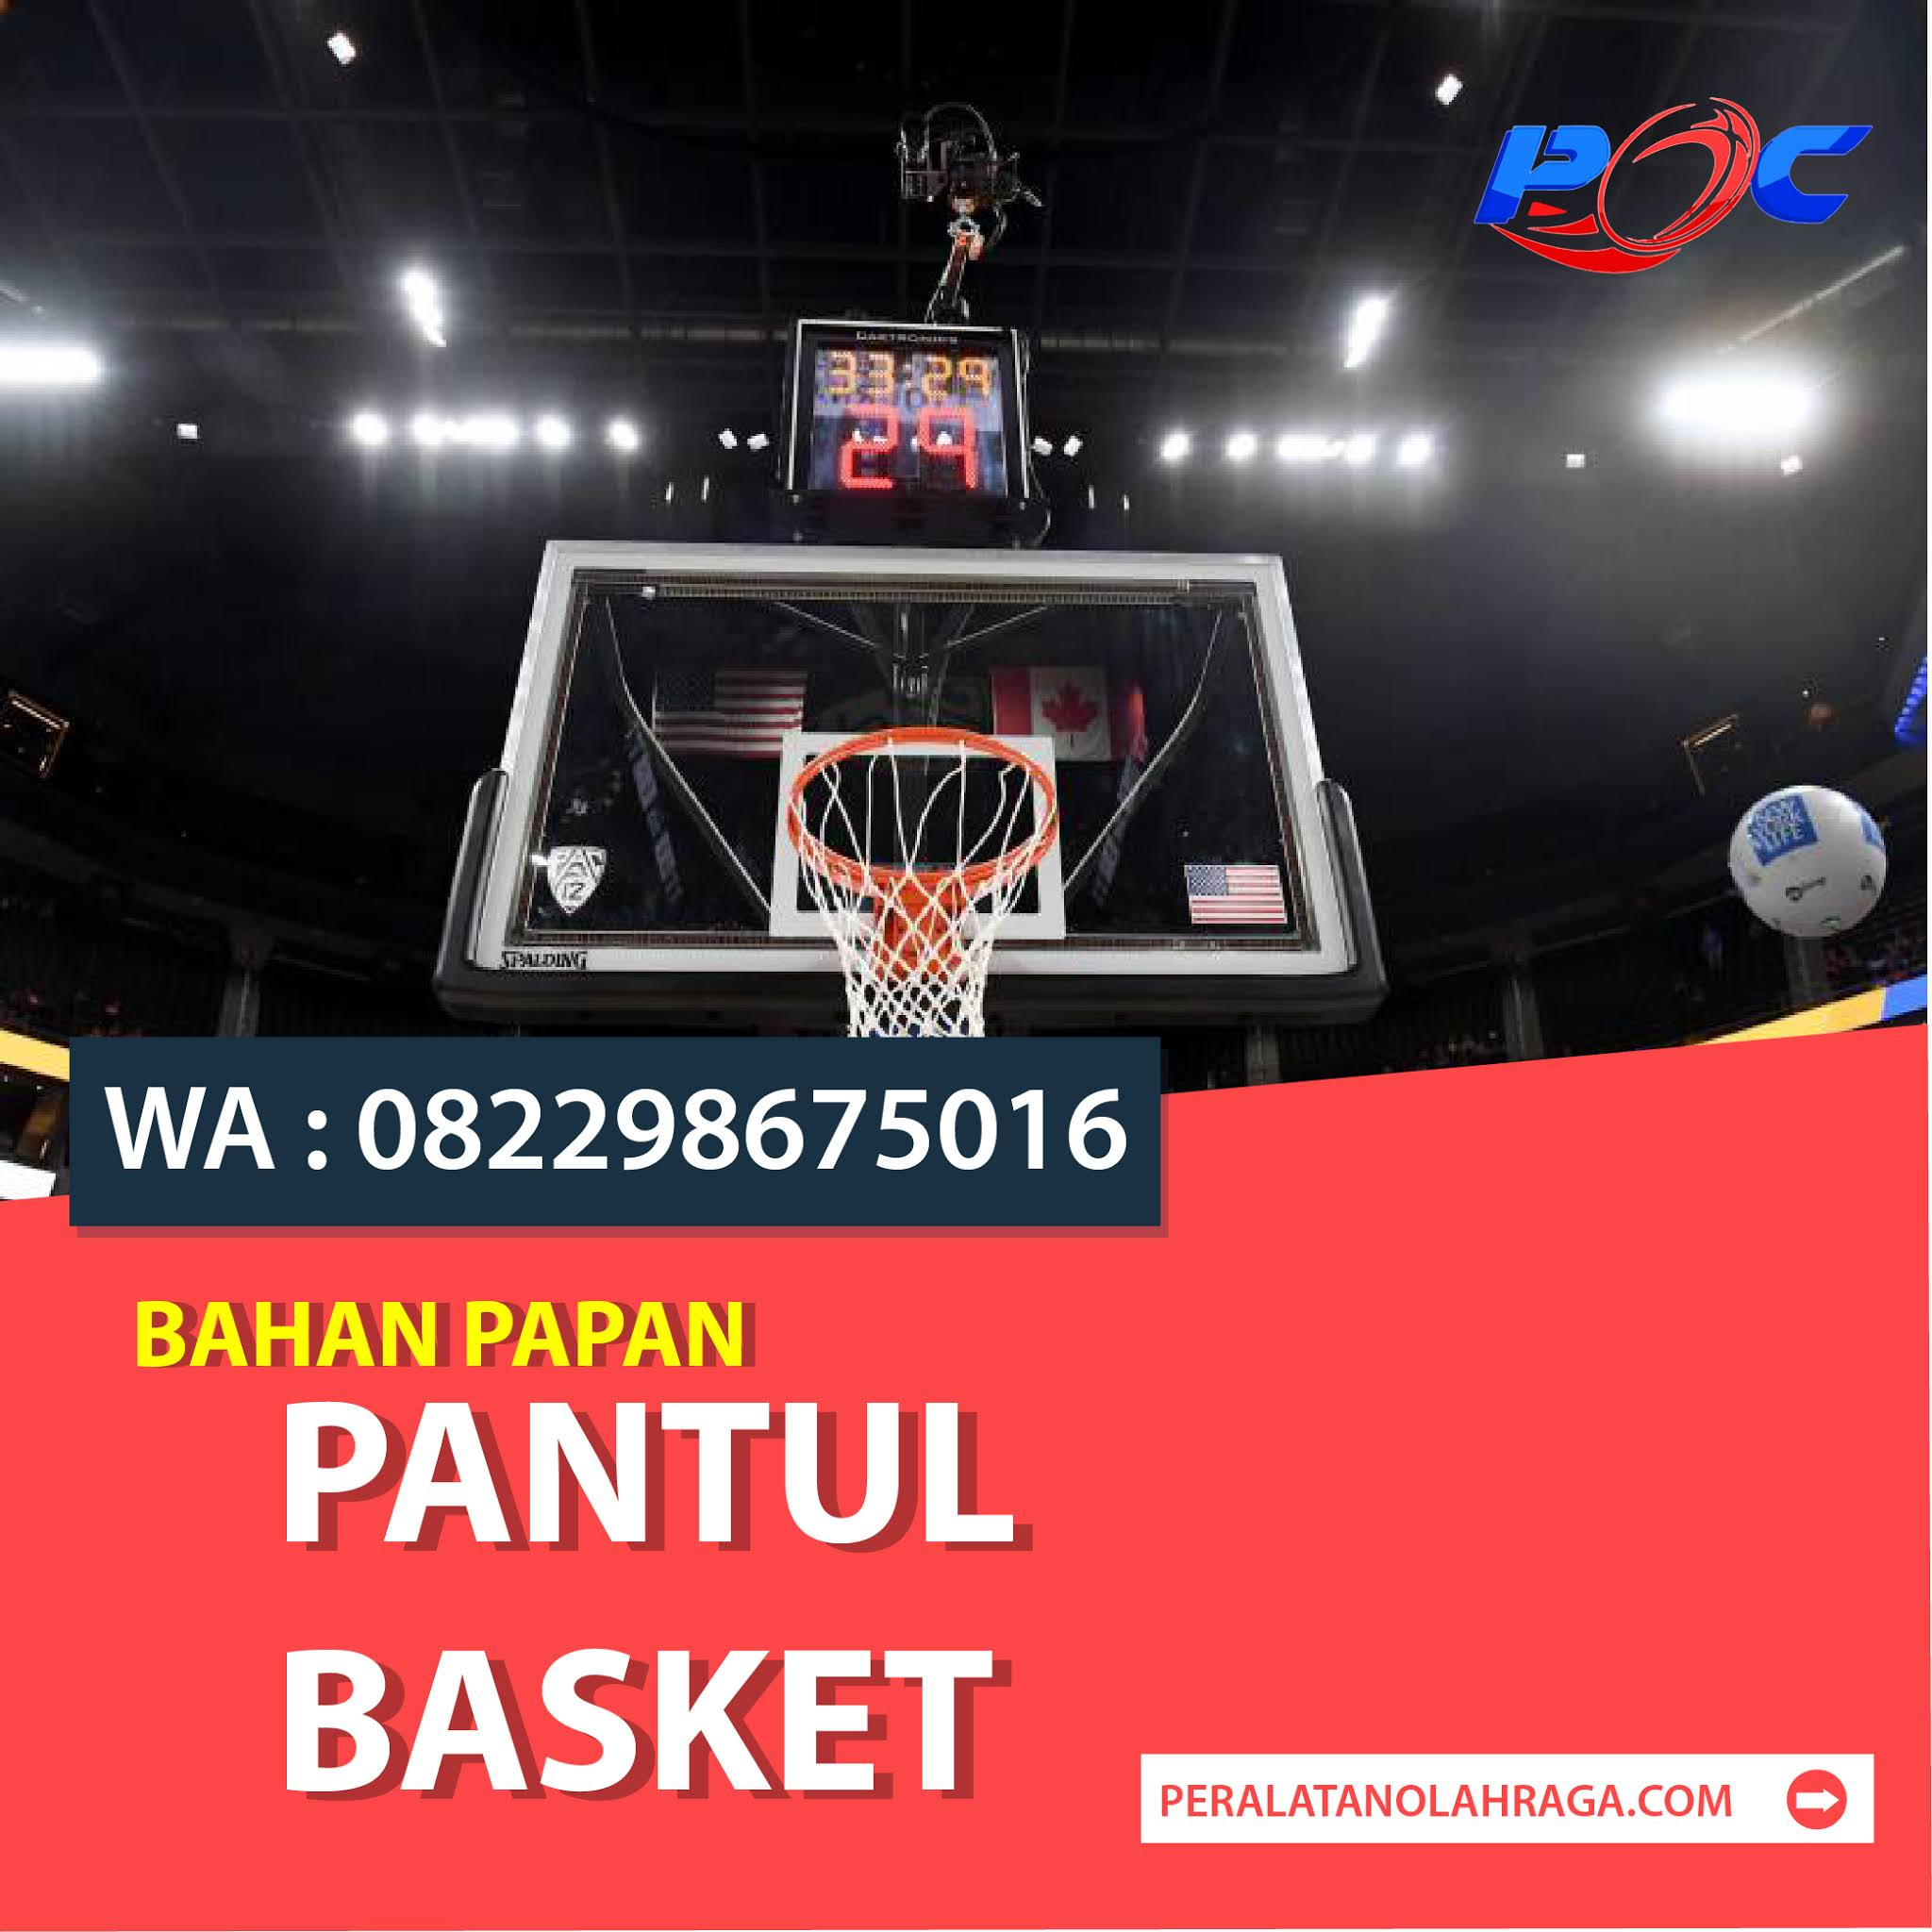 Bahan Papan Pantul Basket